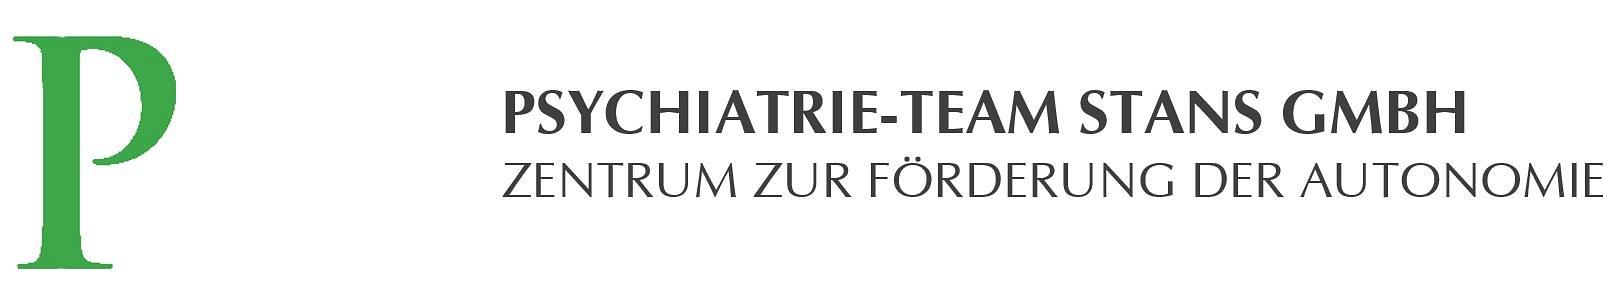 Psychiatrie-Team Stans GmbH